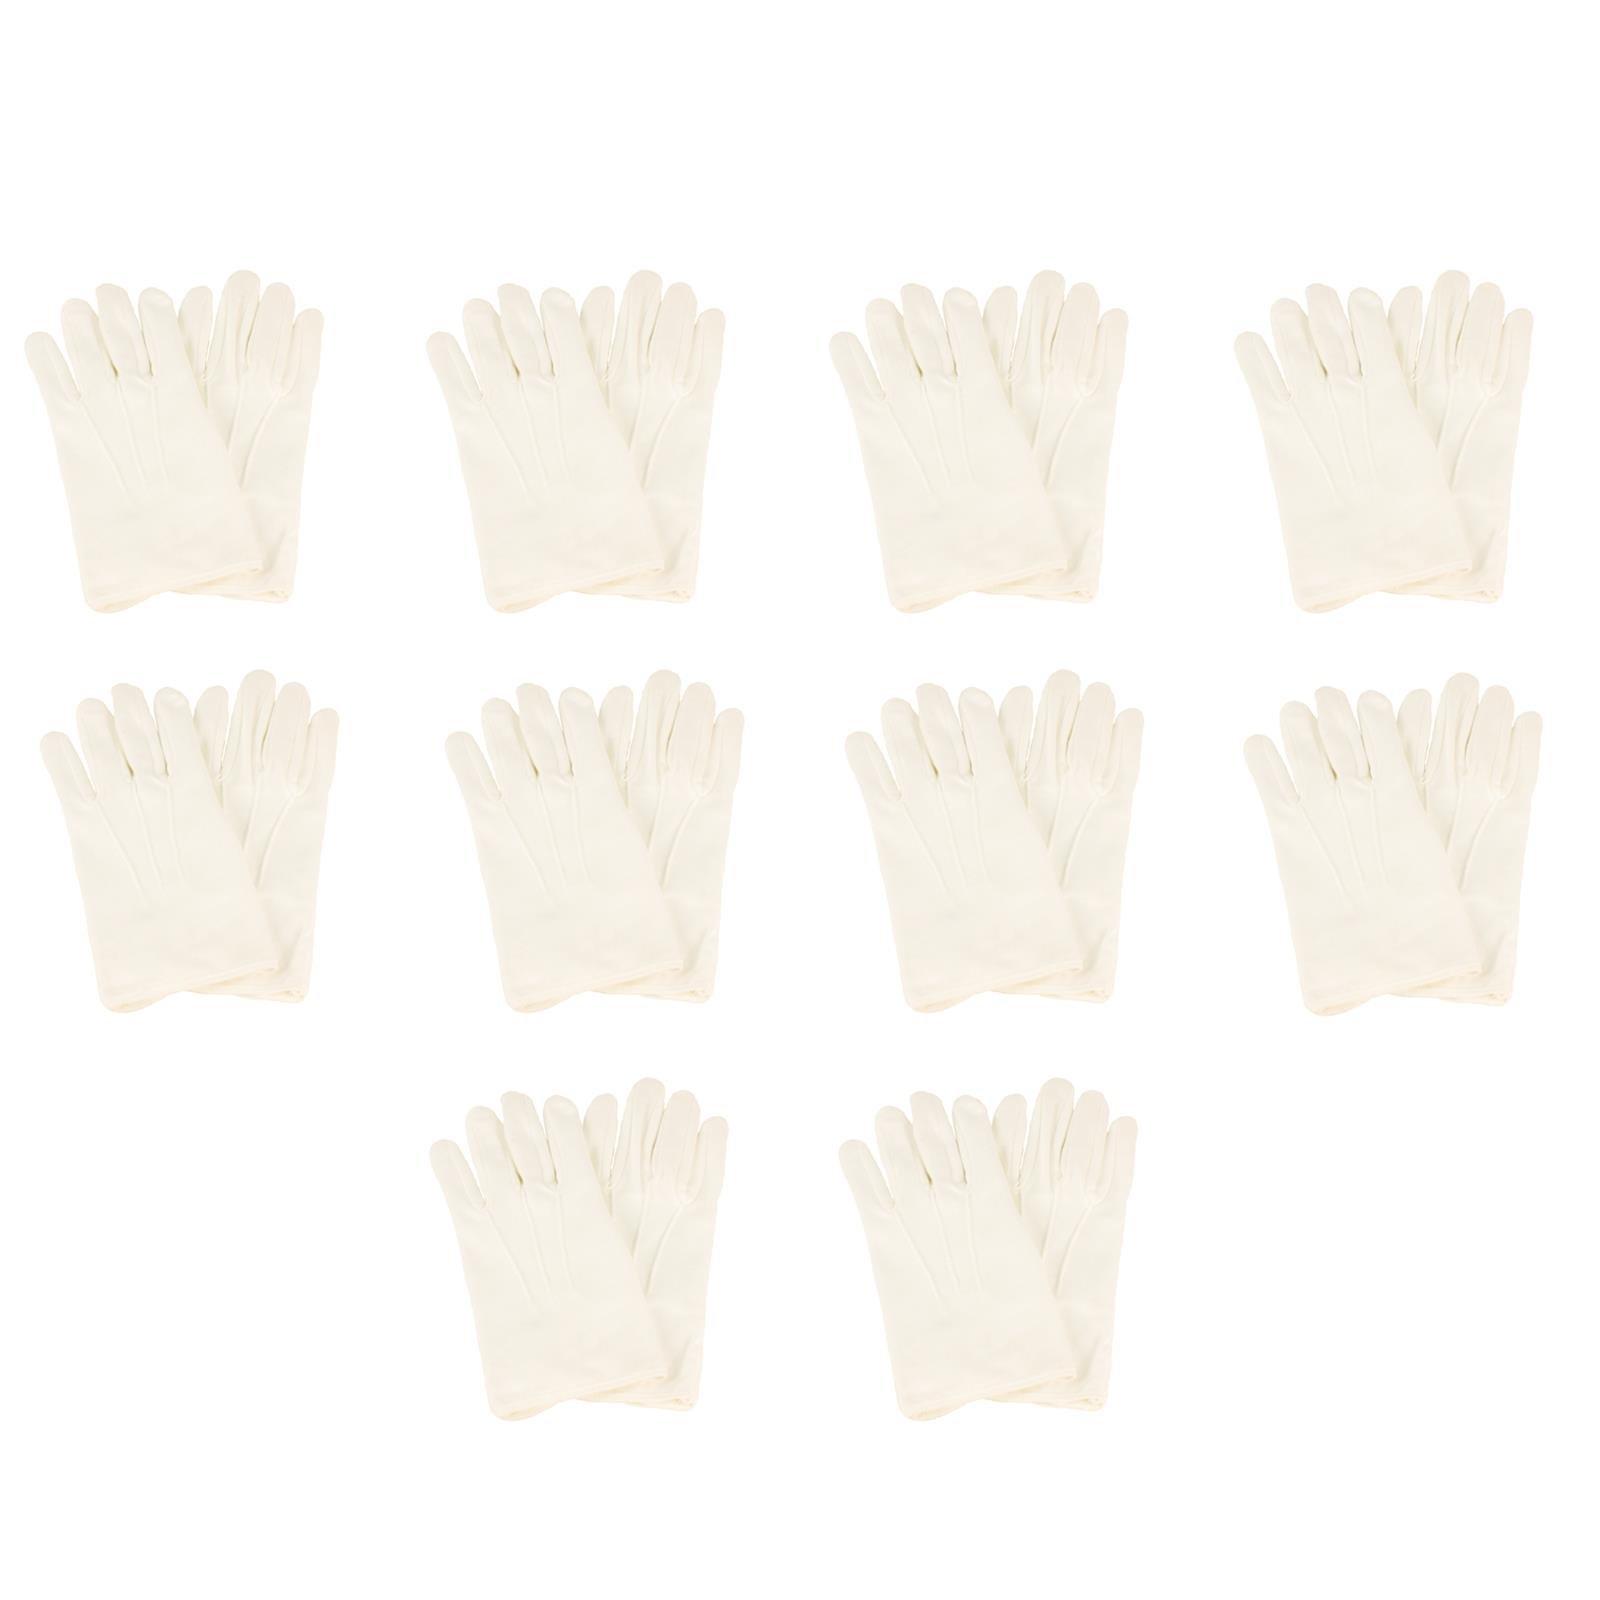 Men's Matte 100% Cotton Stretchy Wrist Plain Blank Thin Gloves White 10 Pair X-Large